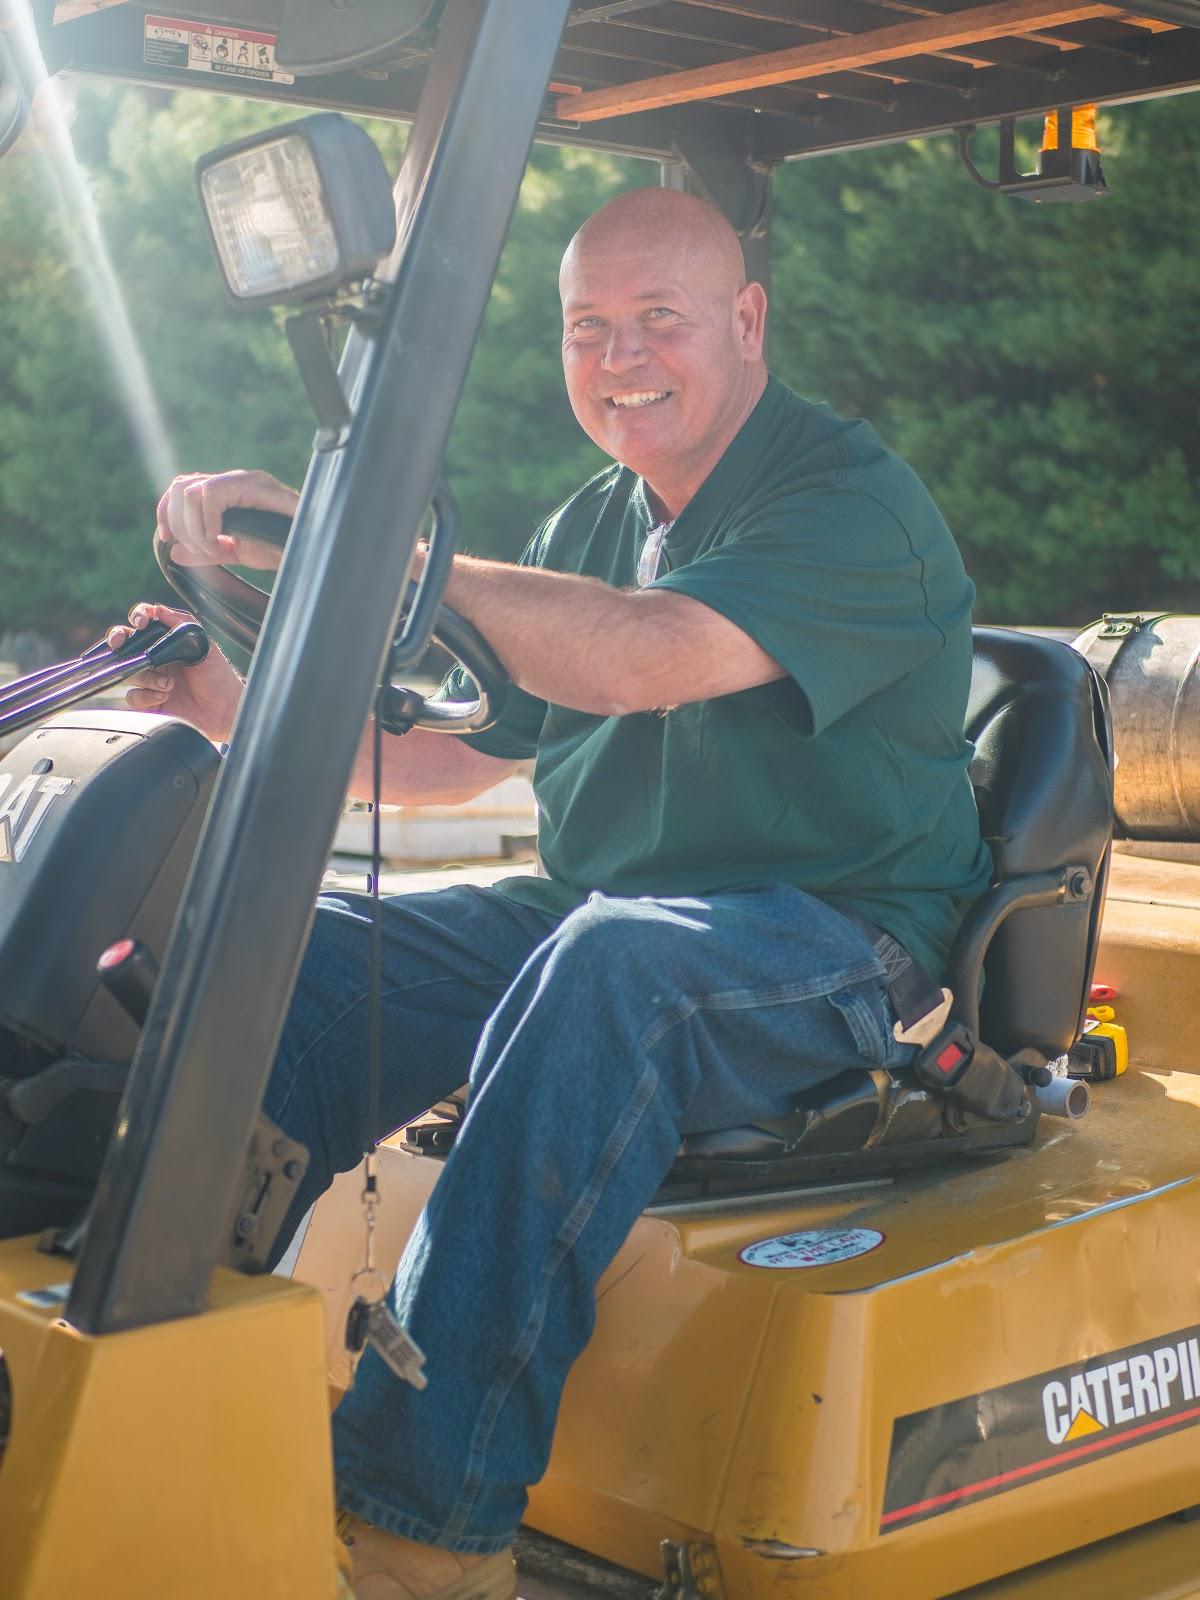 Photo of John Farrell, the yard foreman